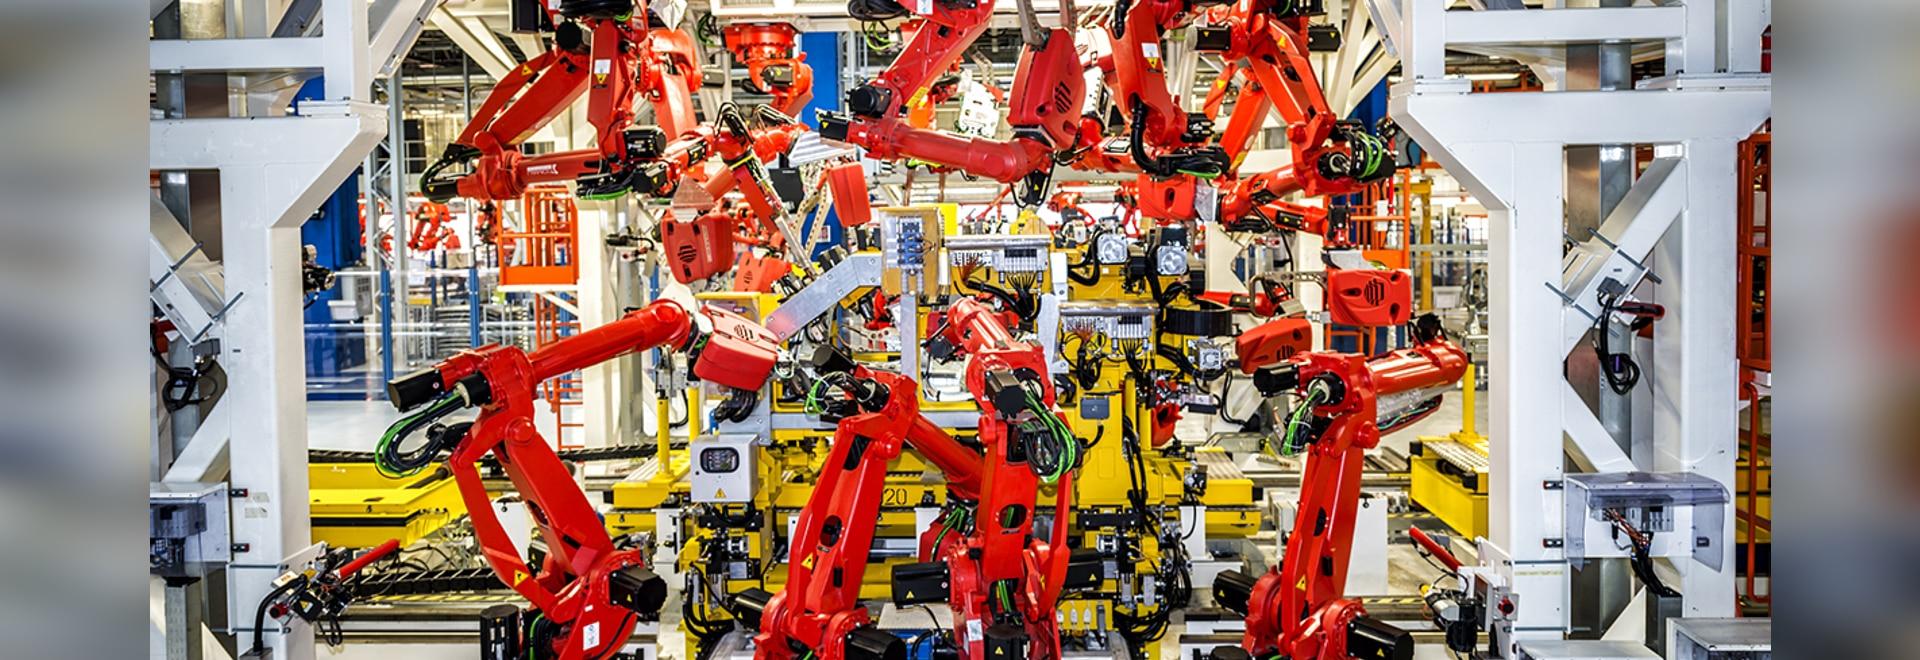 Robots en la subida